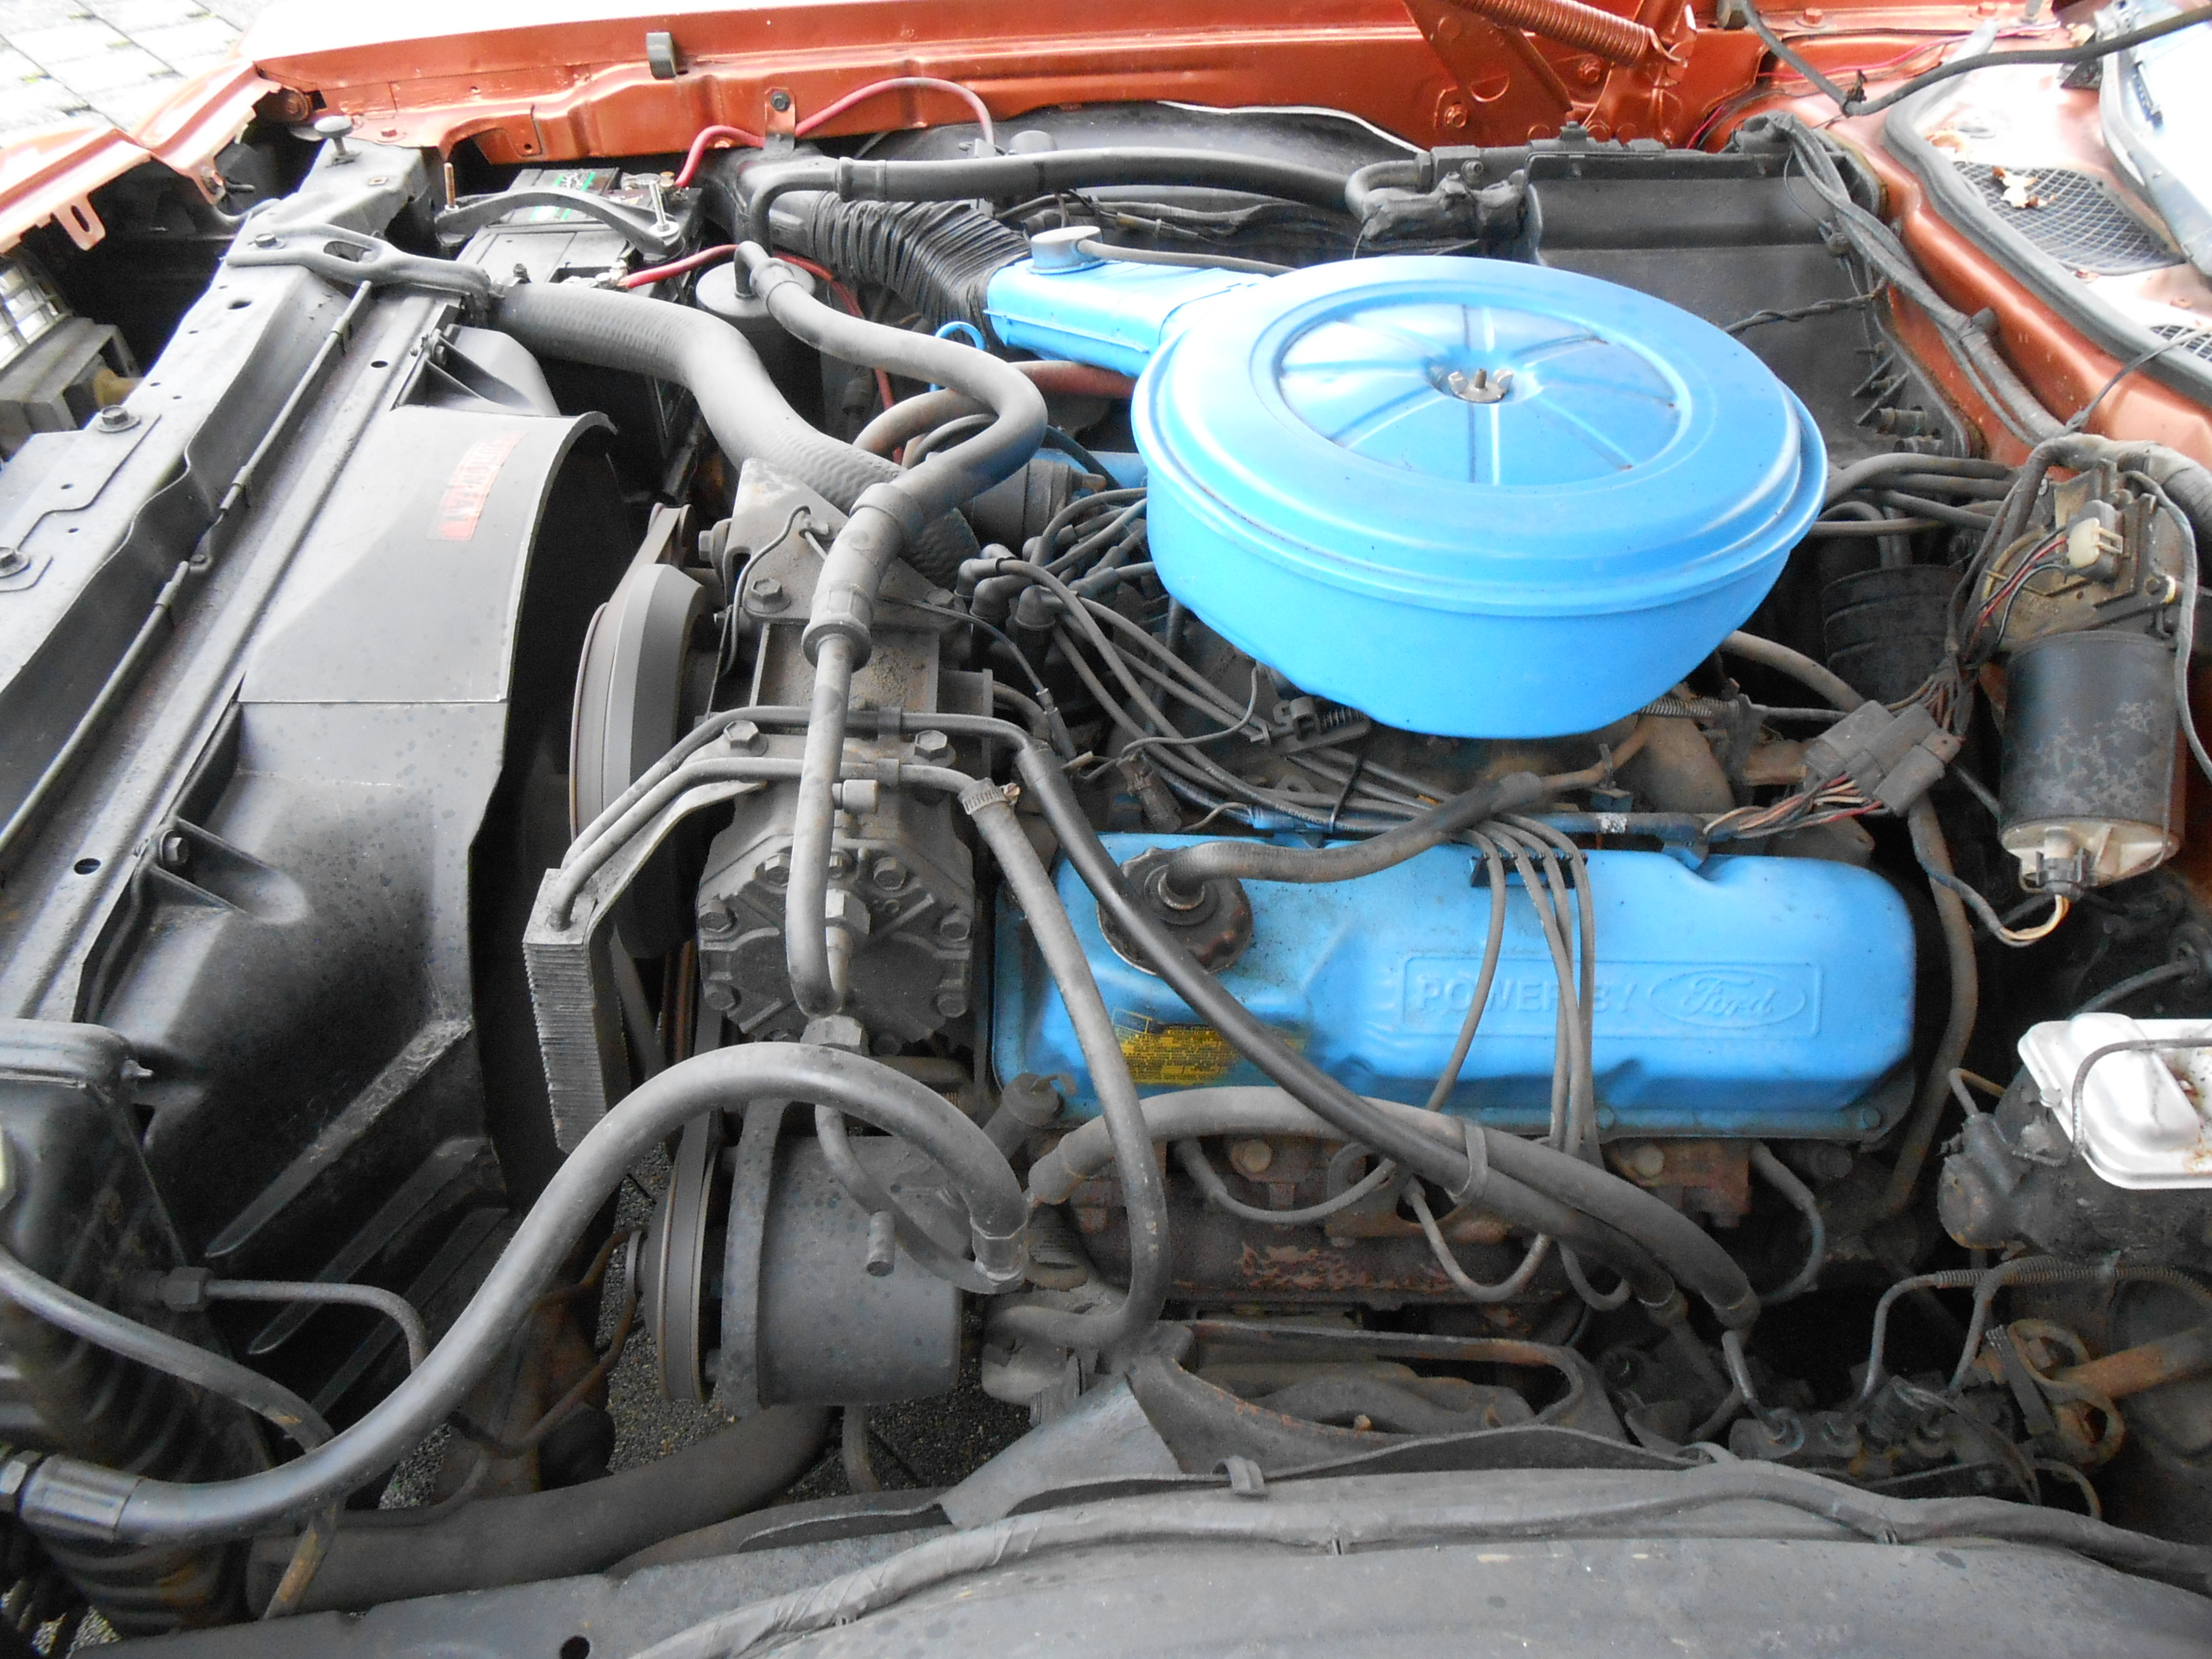 Ford Gran Torino 4-door Sedan